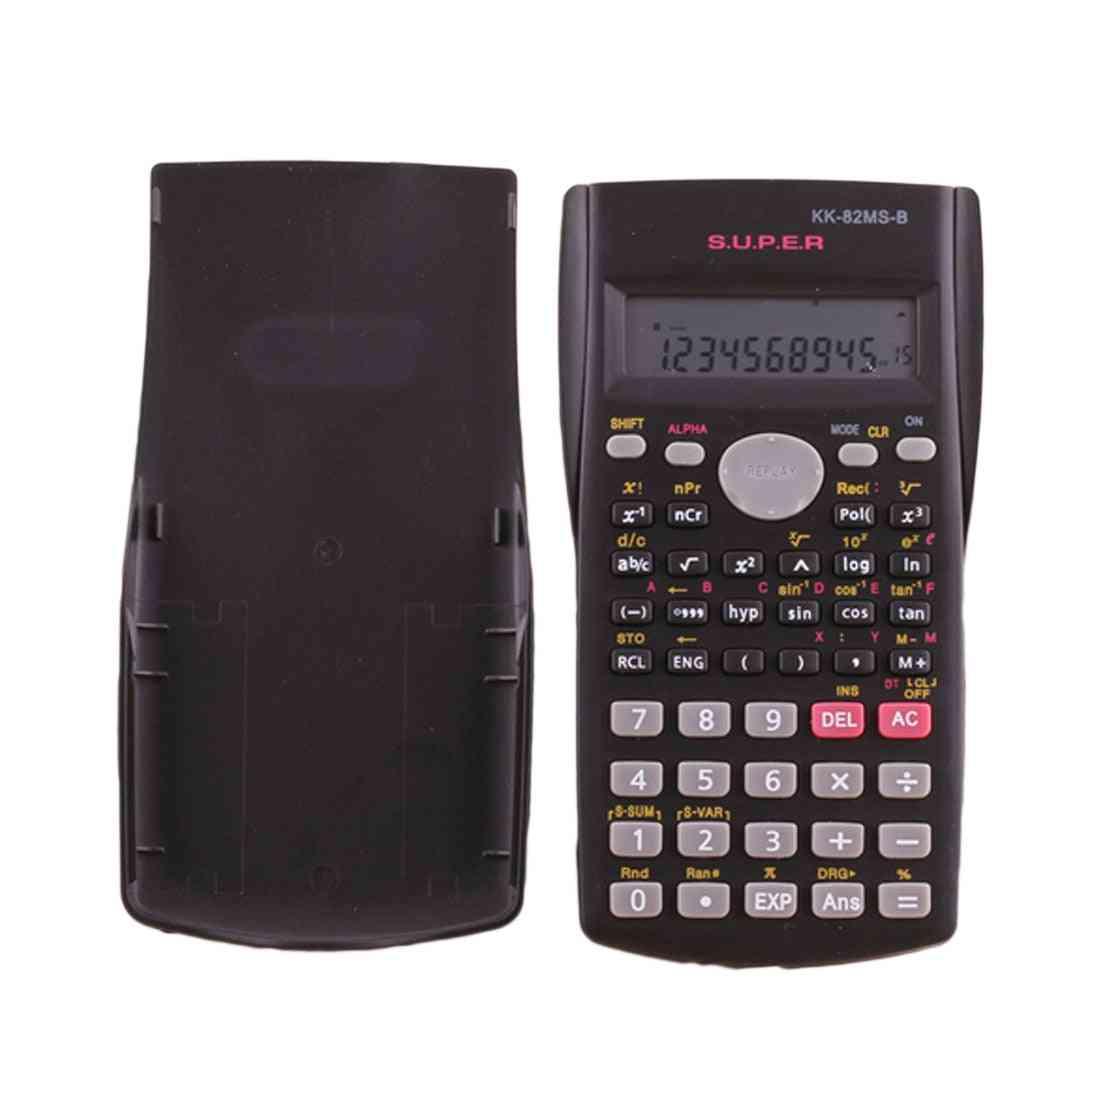 Portable Scientific Student Electronic Calculator